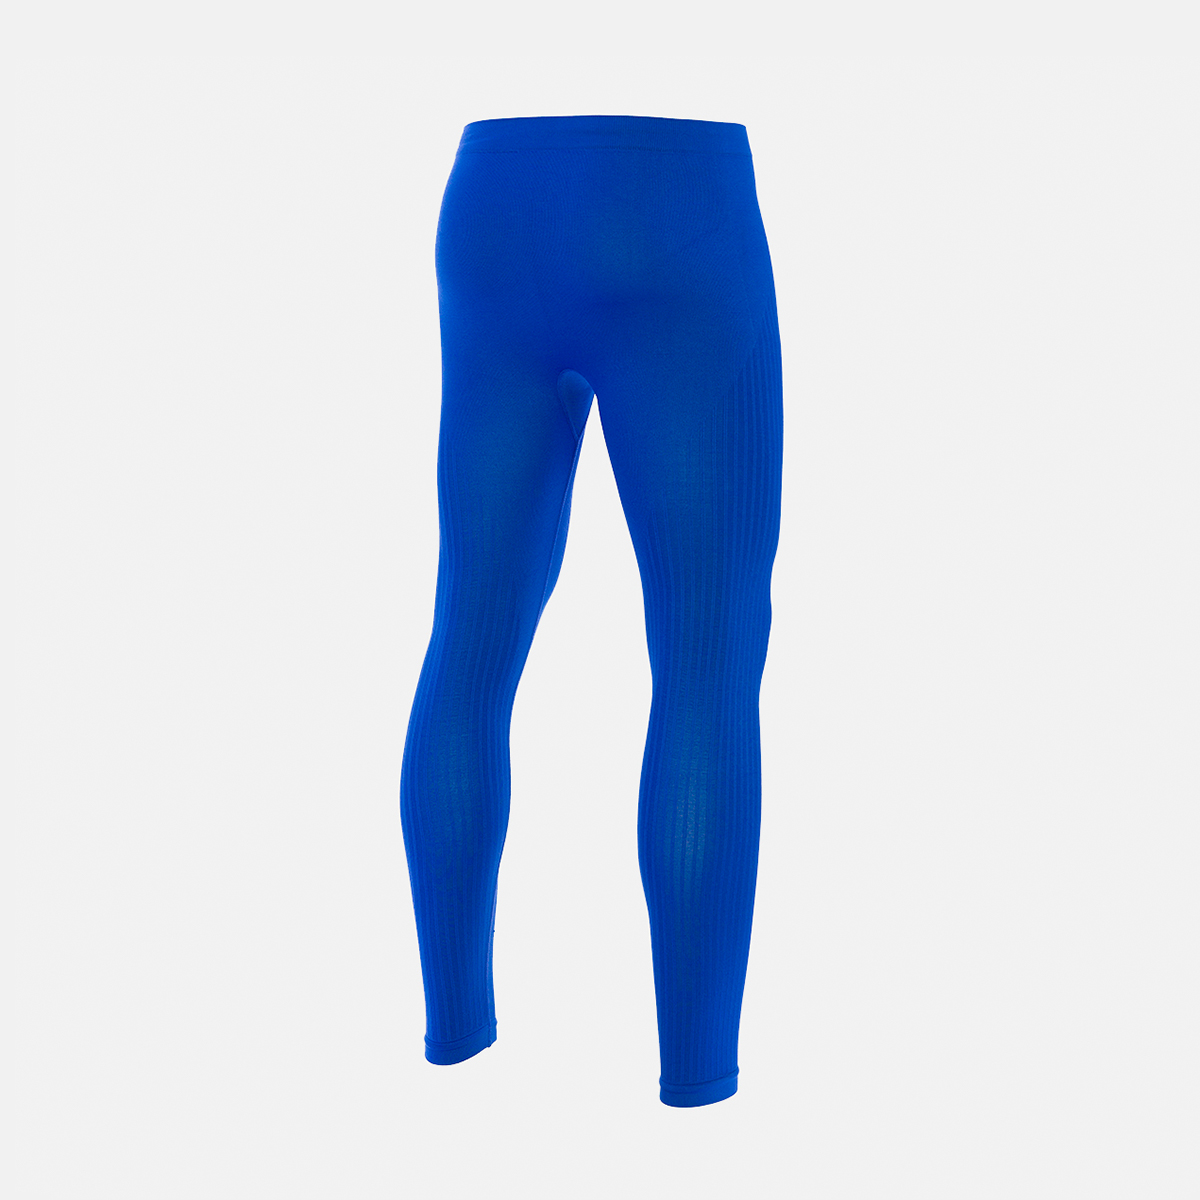 UNISEX'S JASPER THERMAL PANT(ADY-SAONE) BLUE